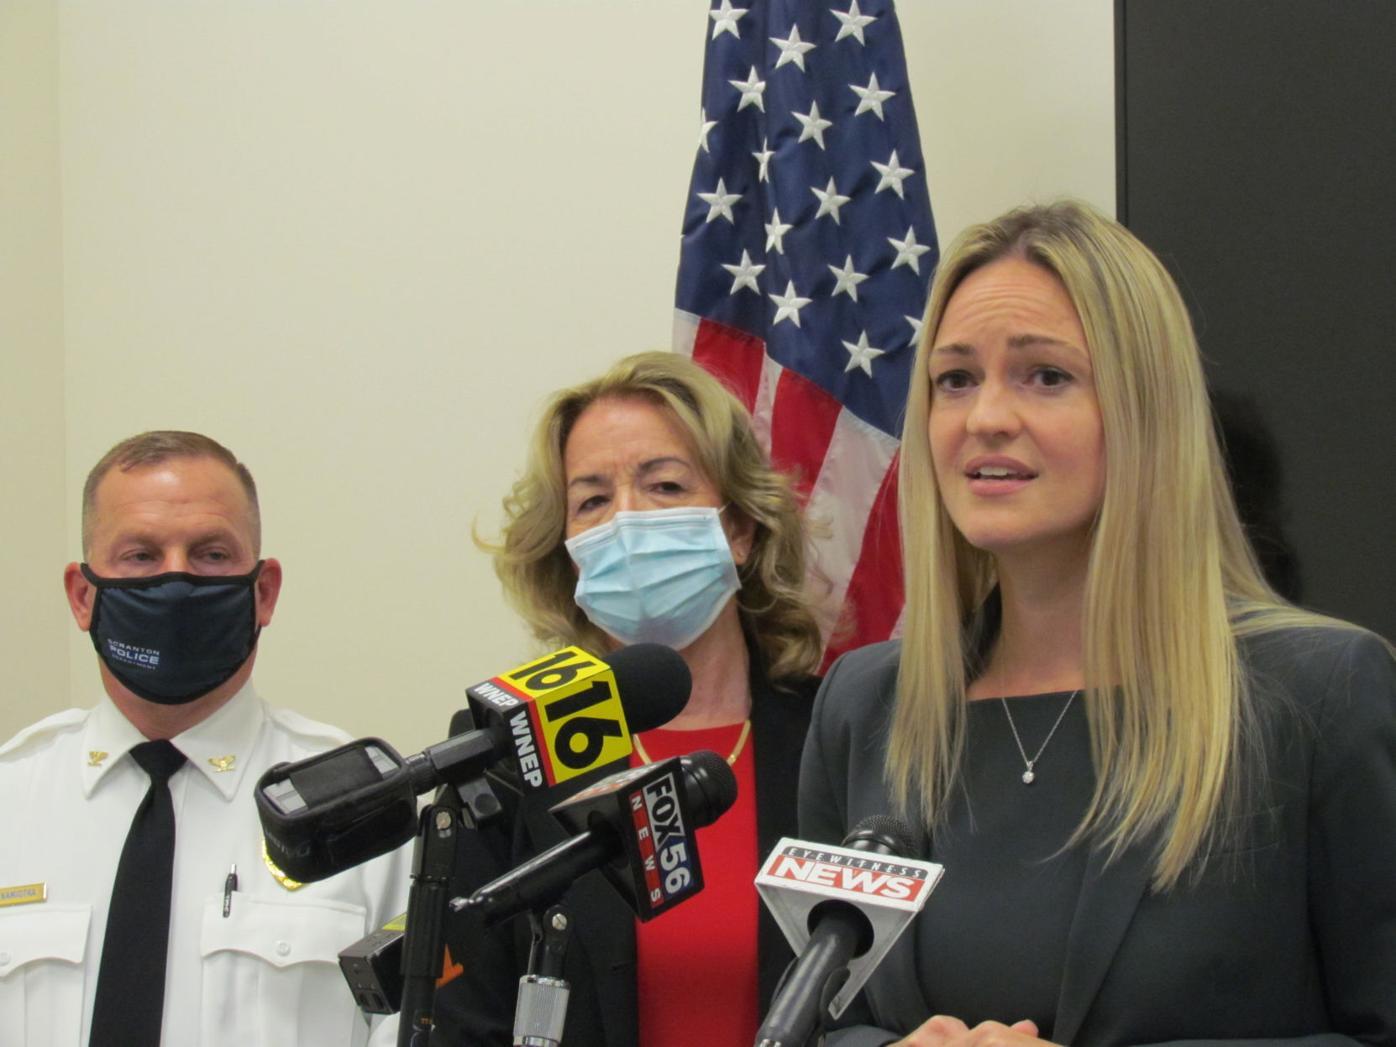 Scranton will seek to decriminalize fentanyl testing strips in city